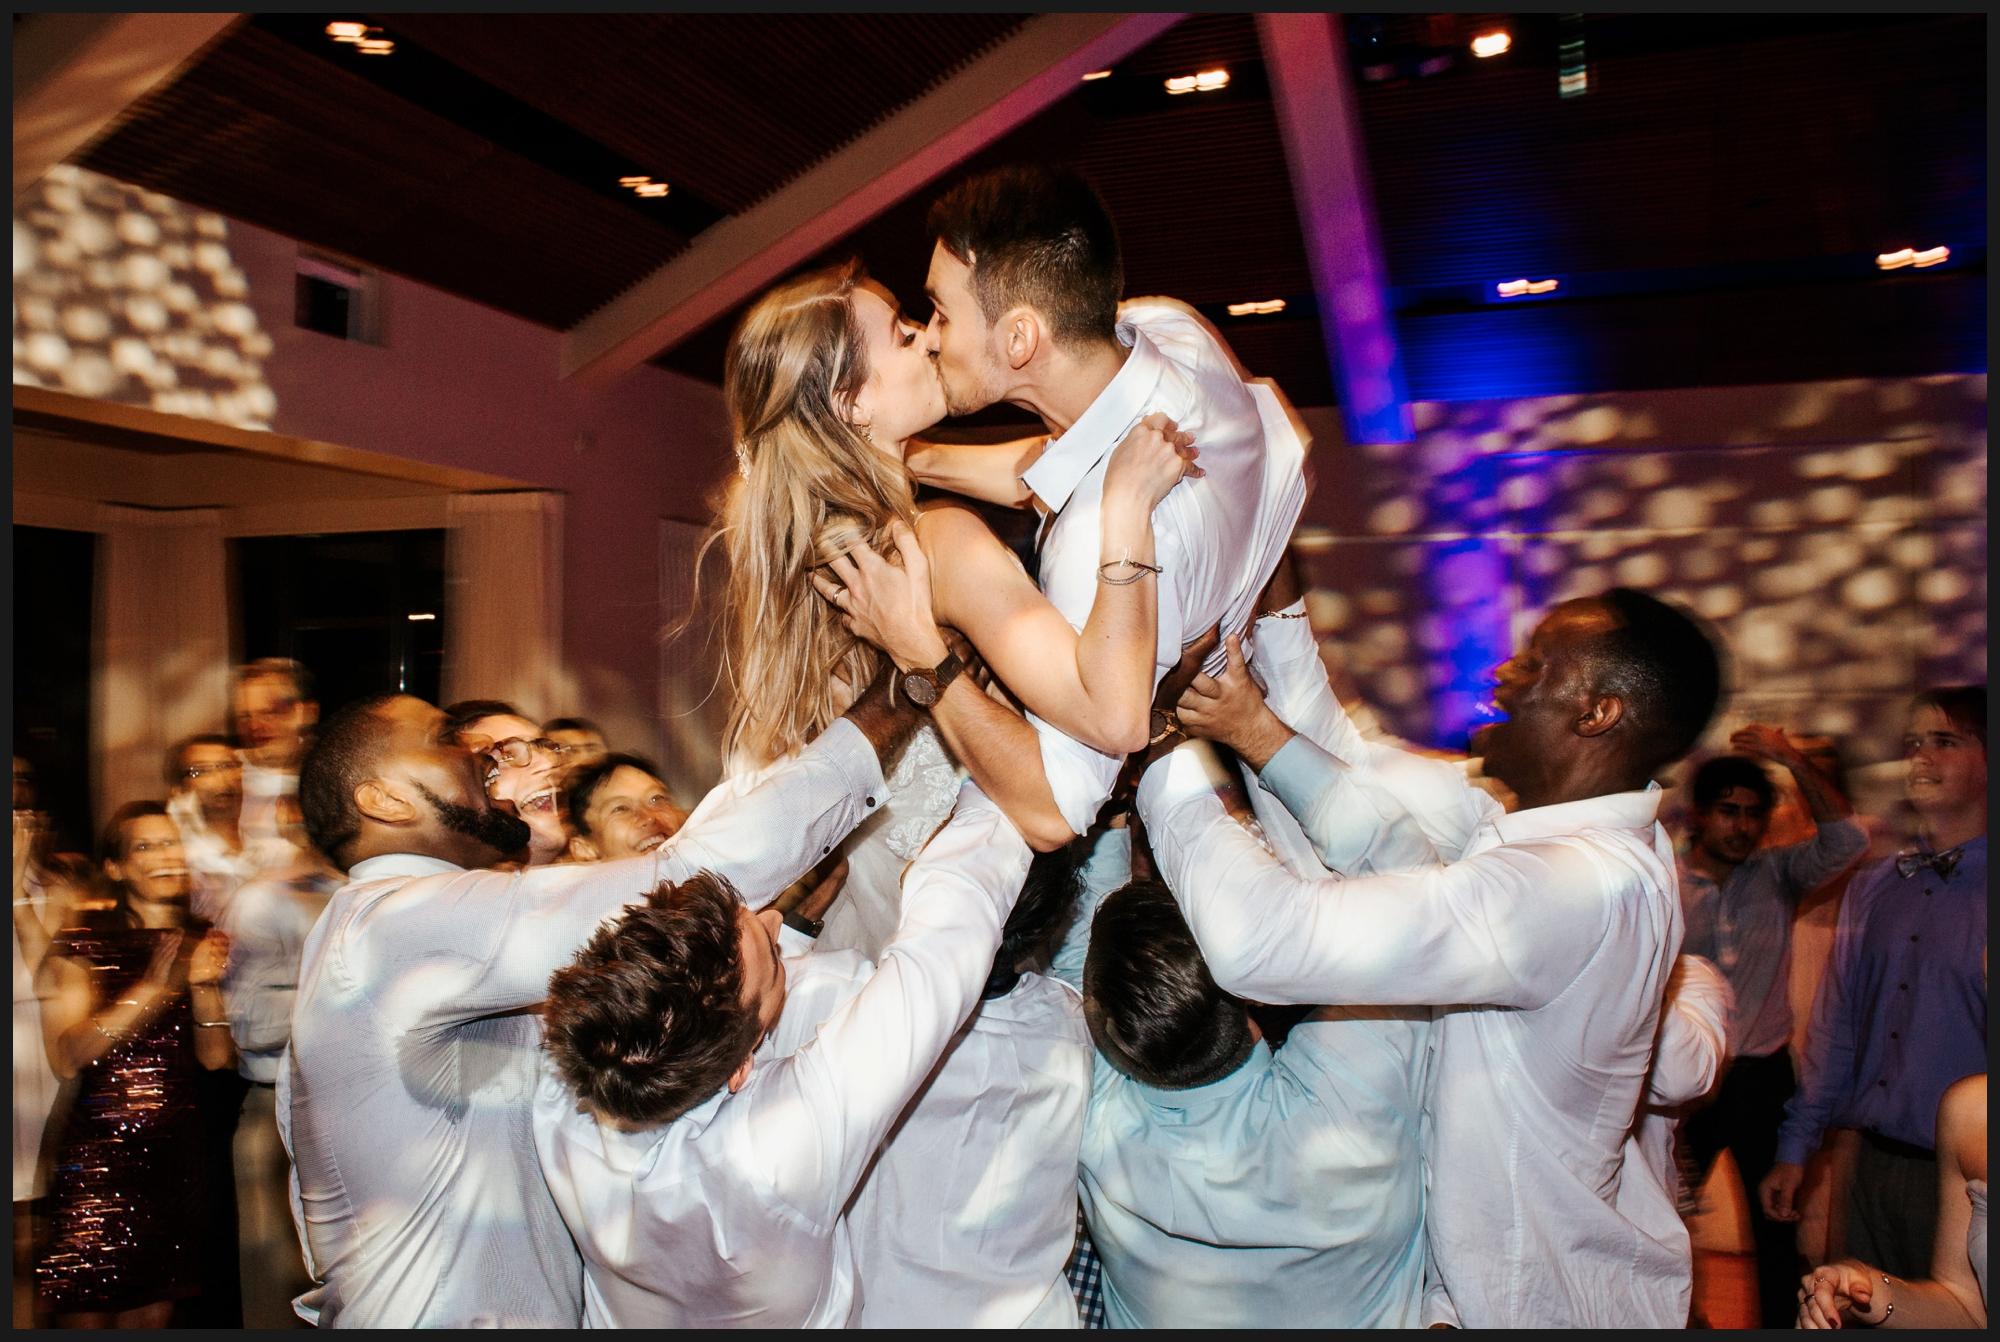 Orlando-Wedding-Photographer-destination-wedding-photographer-florida-wedding-photographer-bohemian-wedding-photographer_0144.jpg